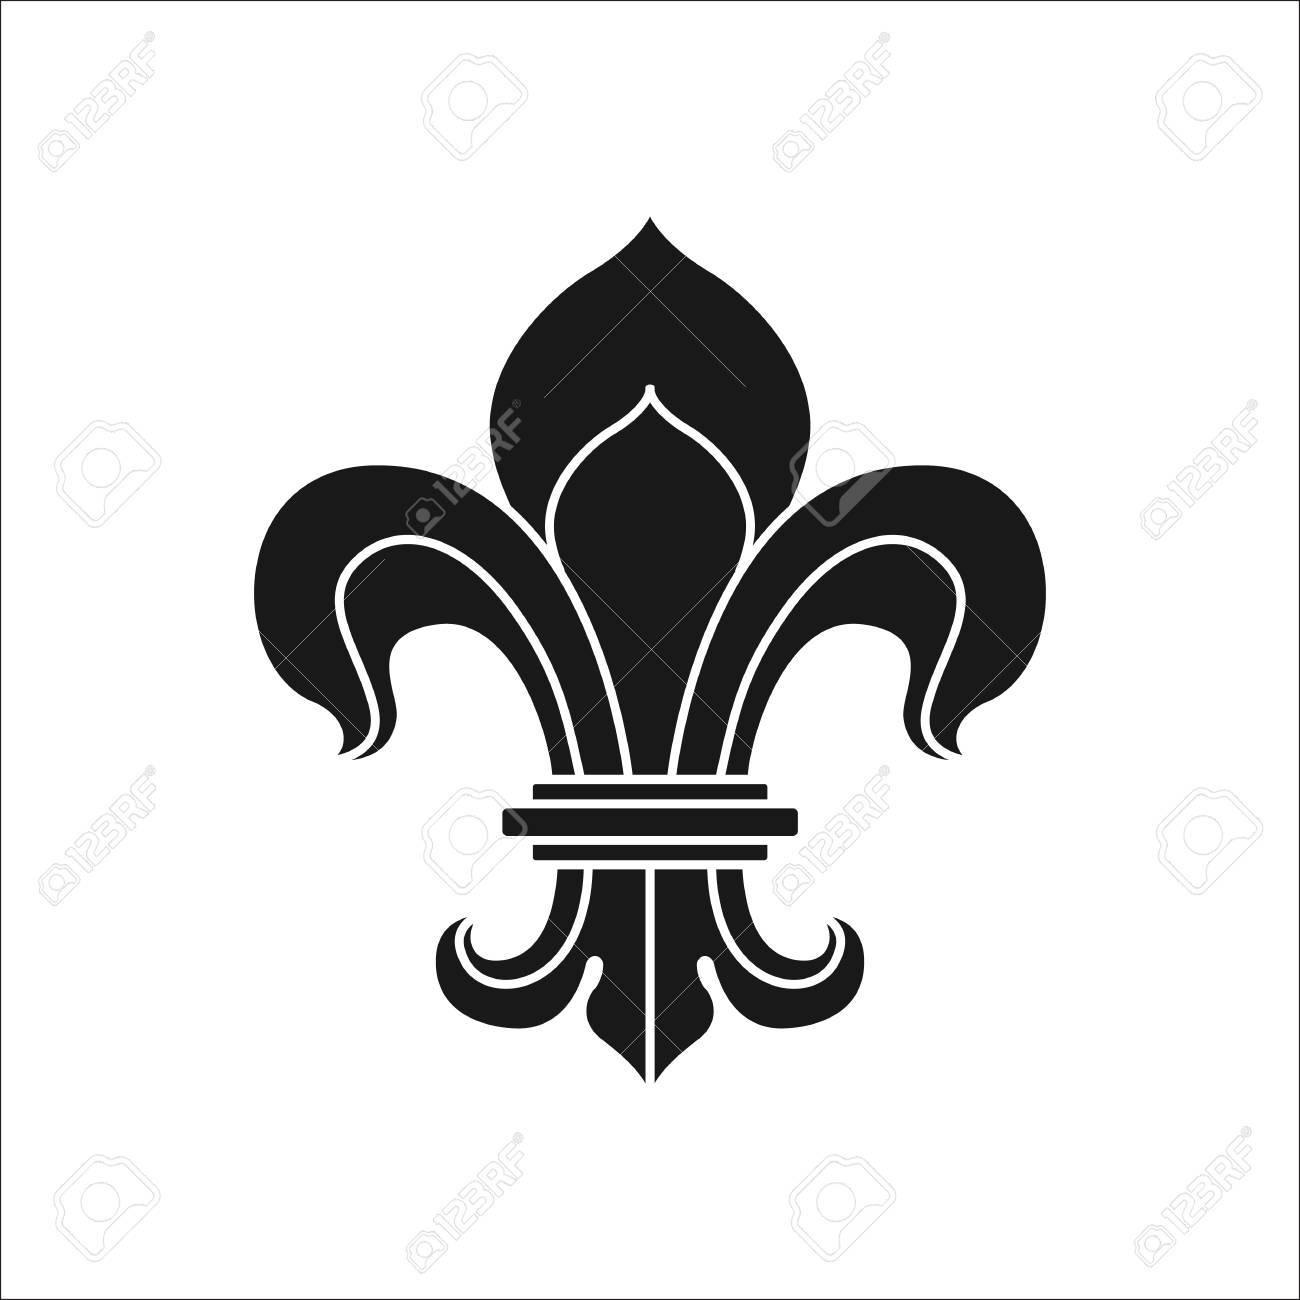 Royal Lily Or Fleur De Lis Symbol Simple Silhouette Icon On